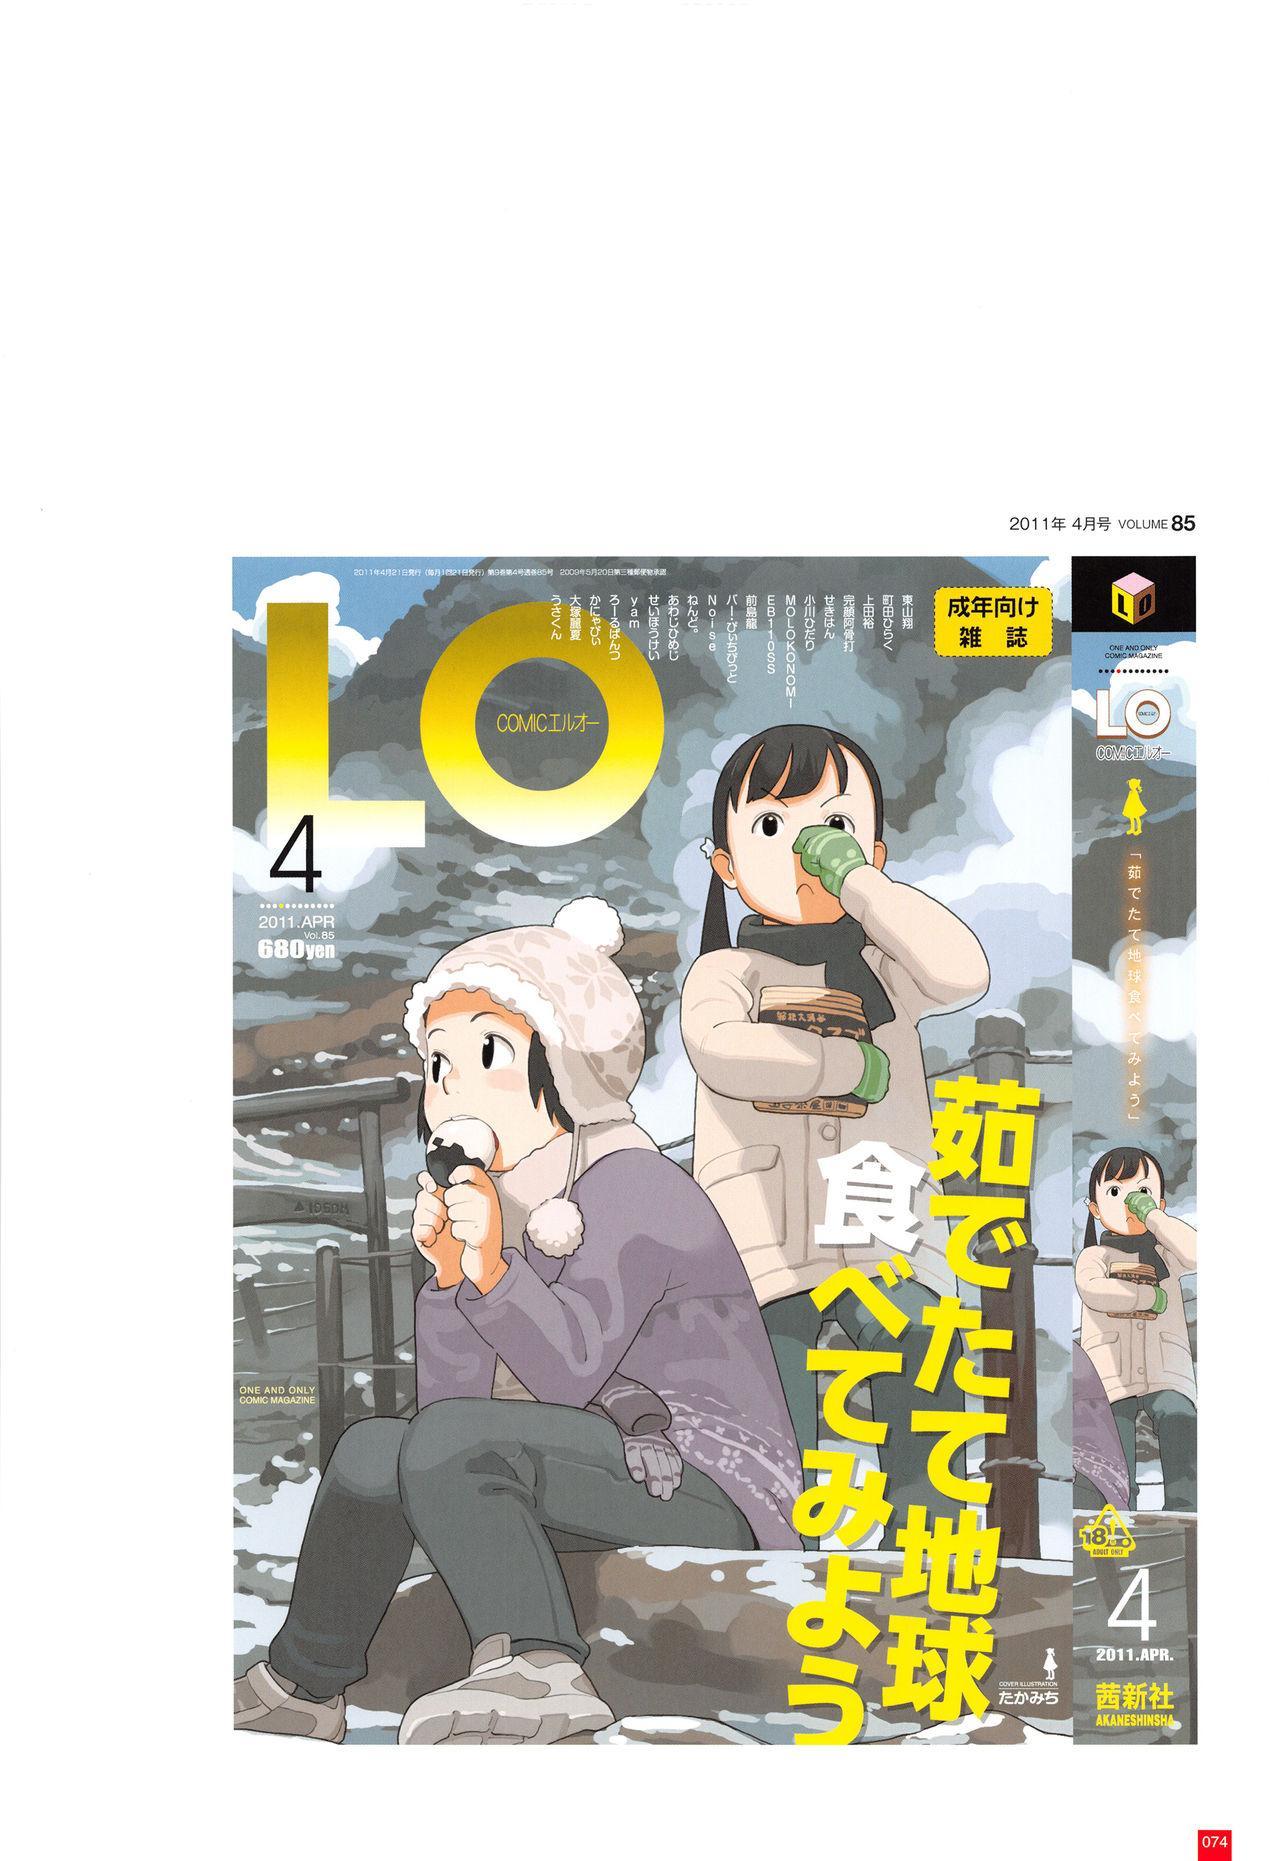 LO Artbook 2-A TAKAMICHI LOOP WORKS 76